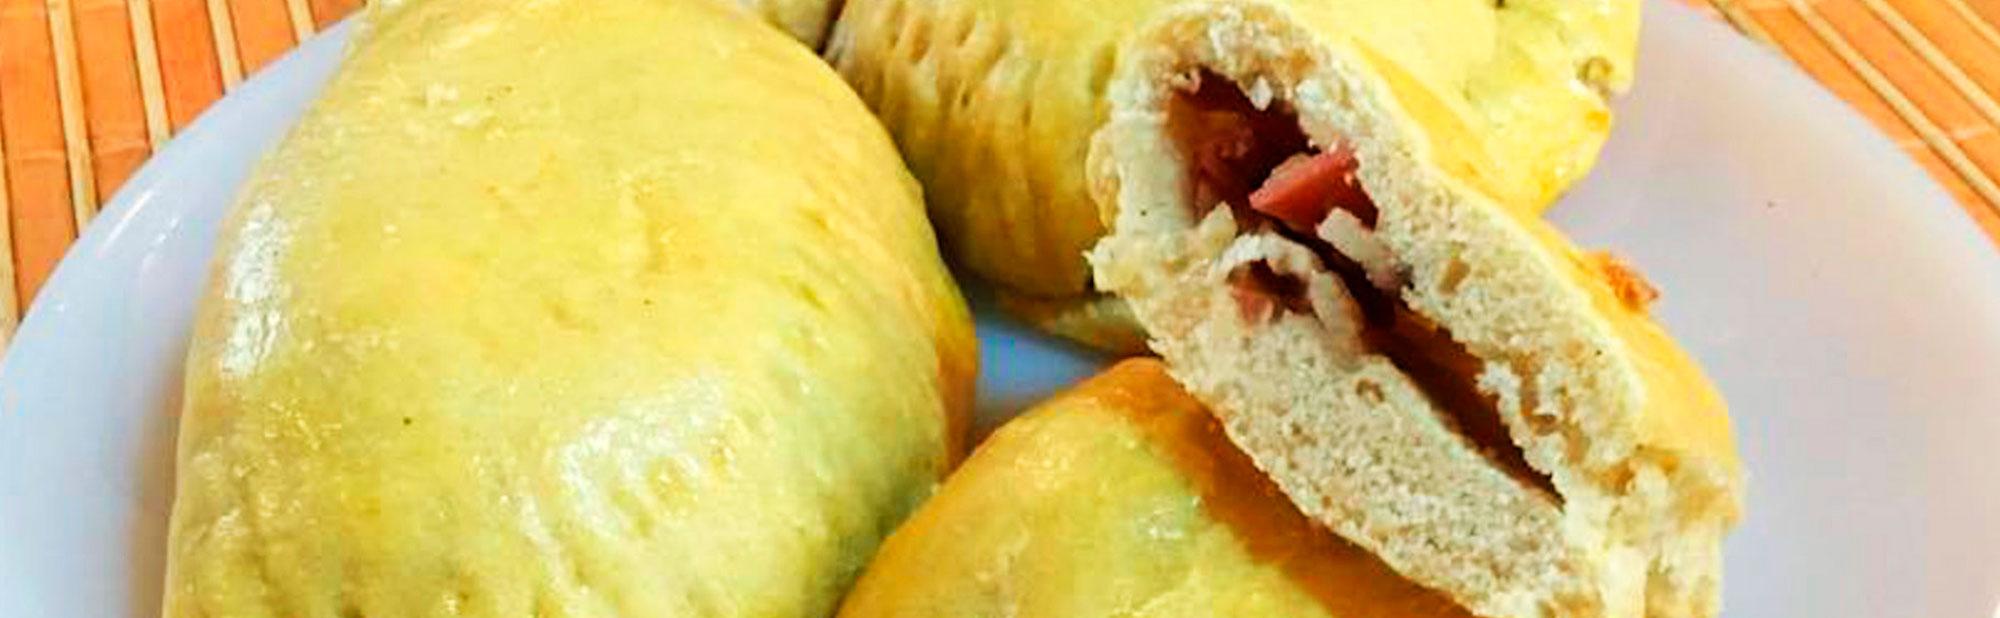 La Antojadera | Empanadas Horneadas